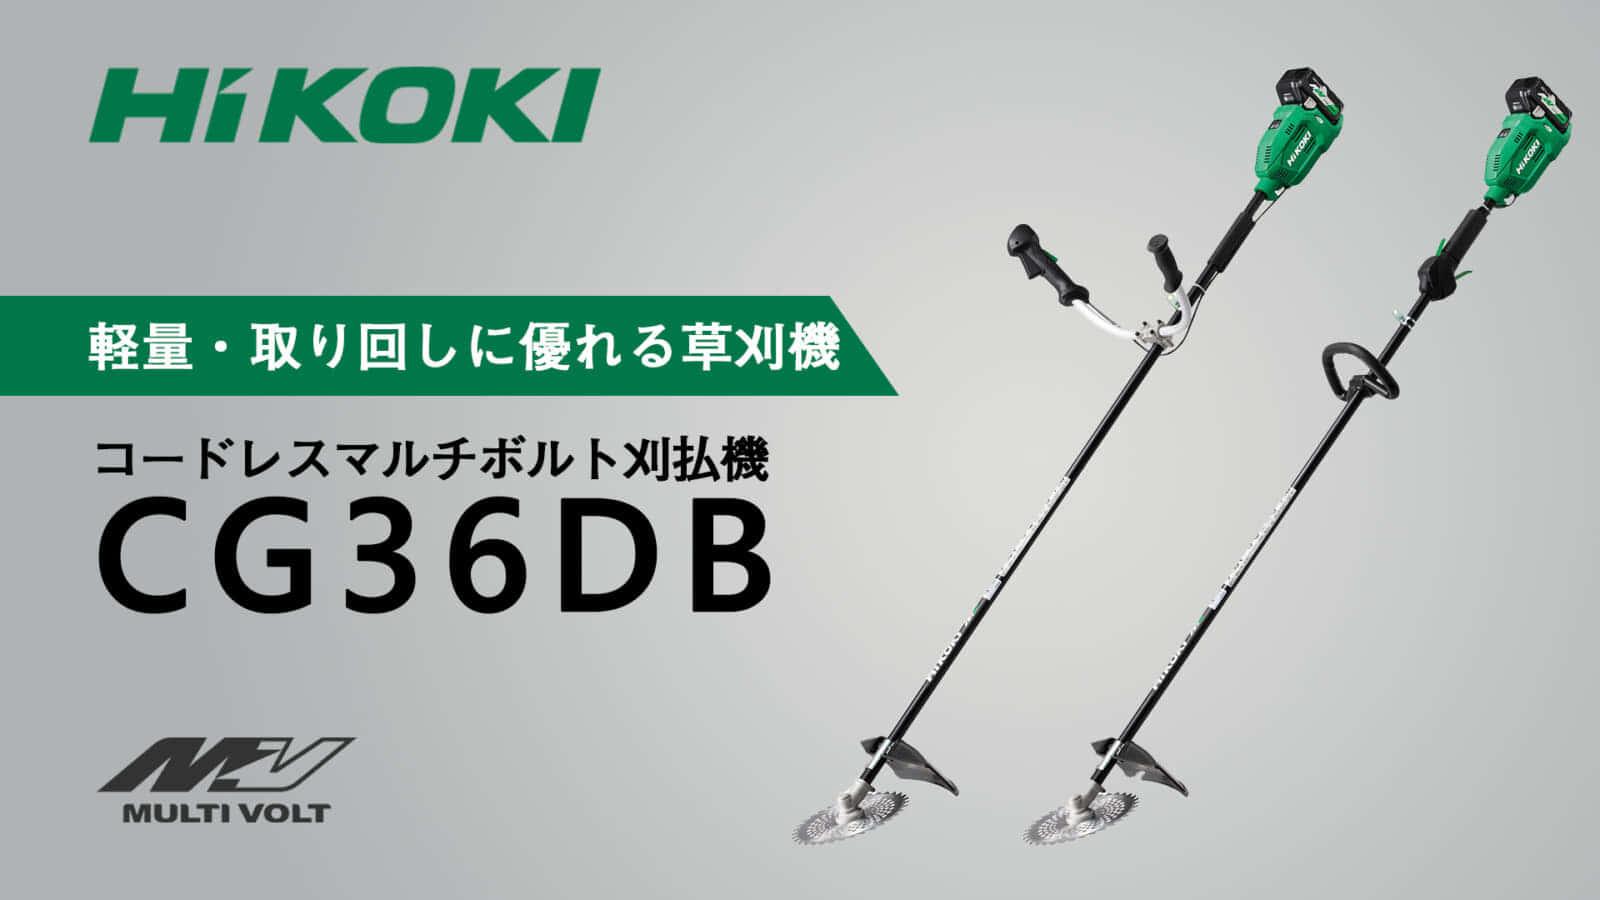 HiKOKI CG36DBコードレス刈払機を発売、充電式トップクラスの軽さ